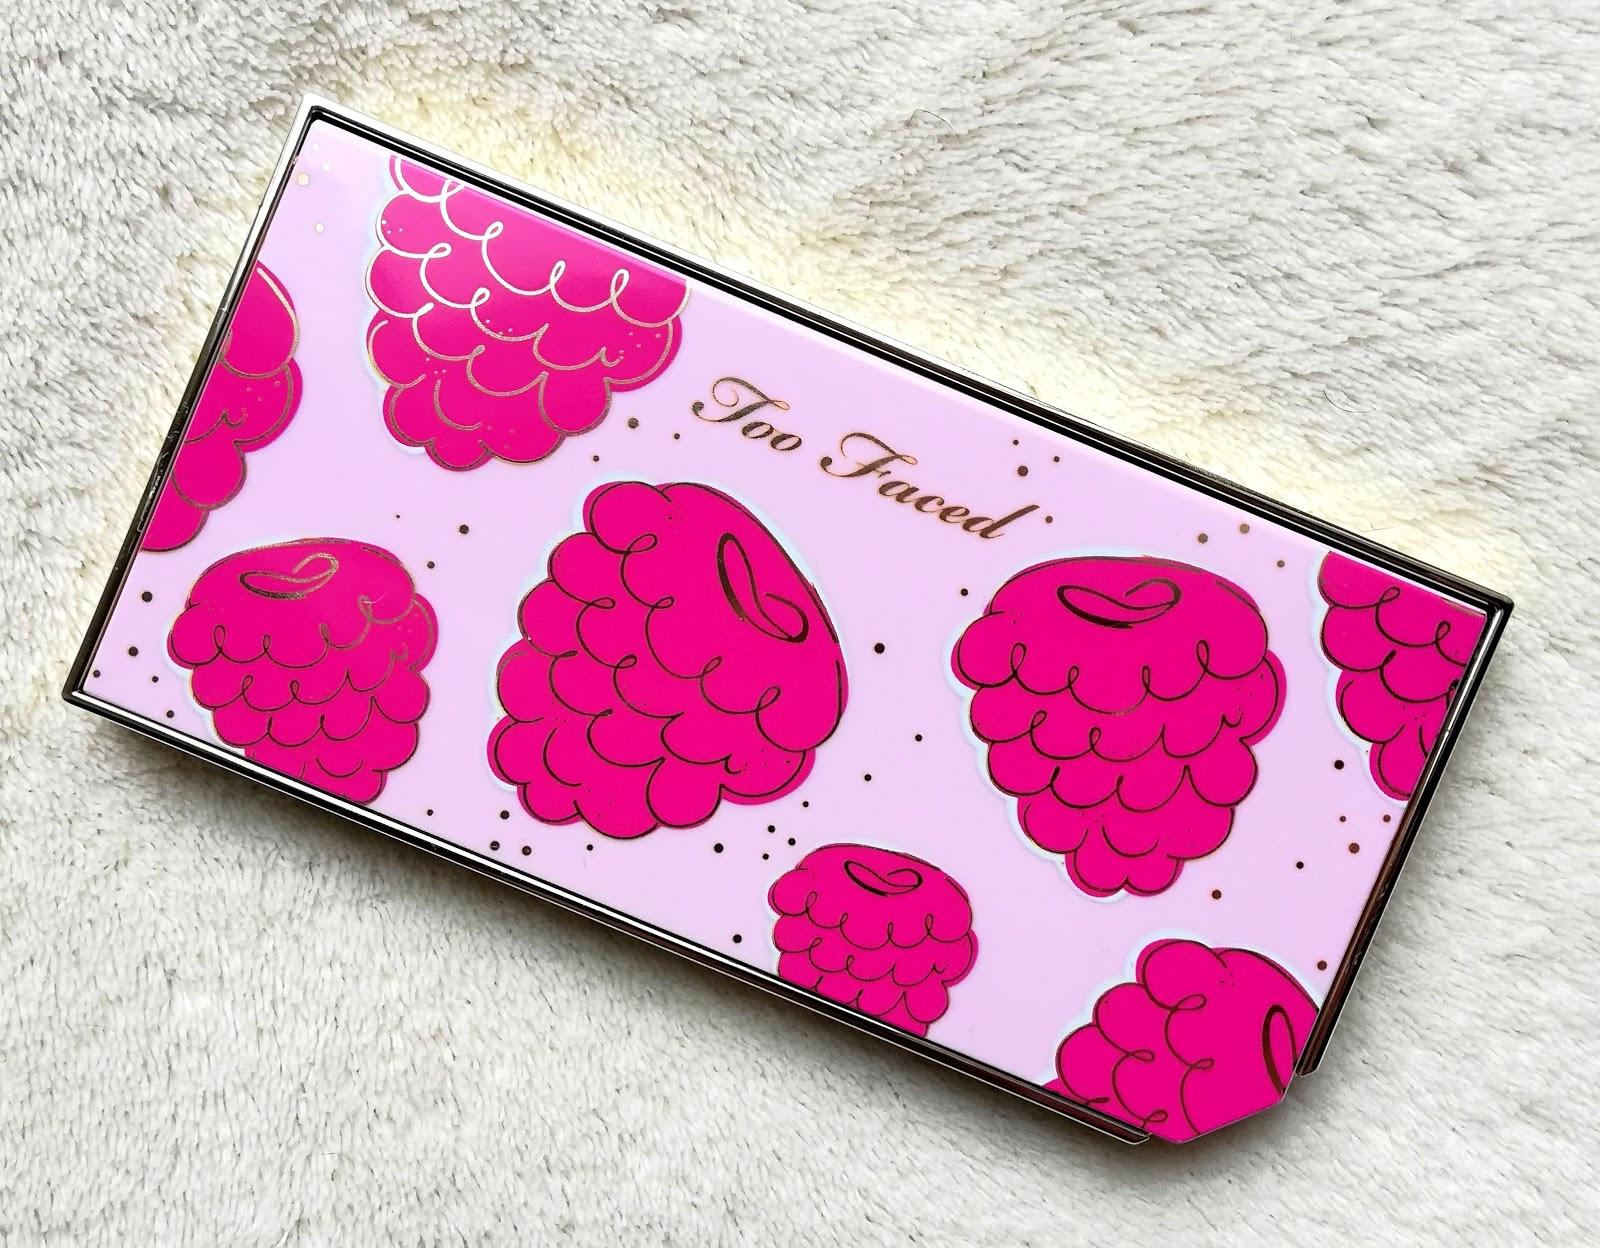 Palette Razzle Dazzle Berry de TOO FACED (make up)